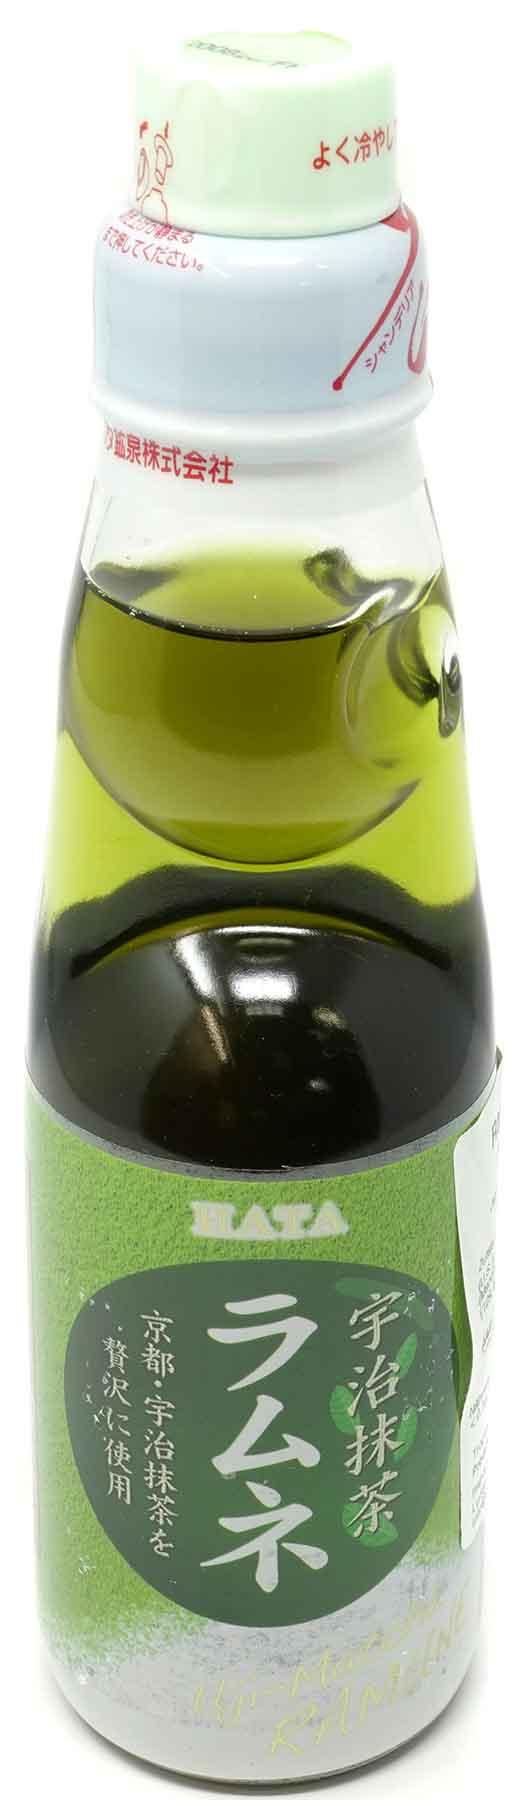 HATA Matcha-Limonade, 200 ml